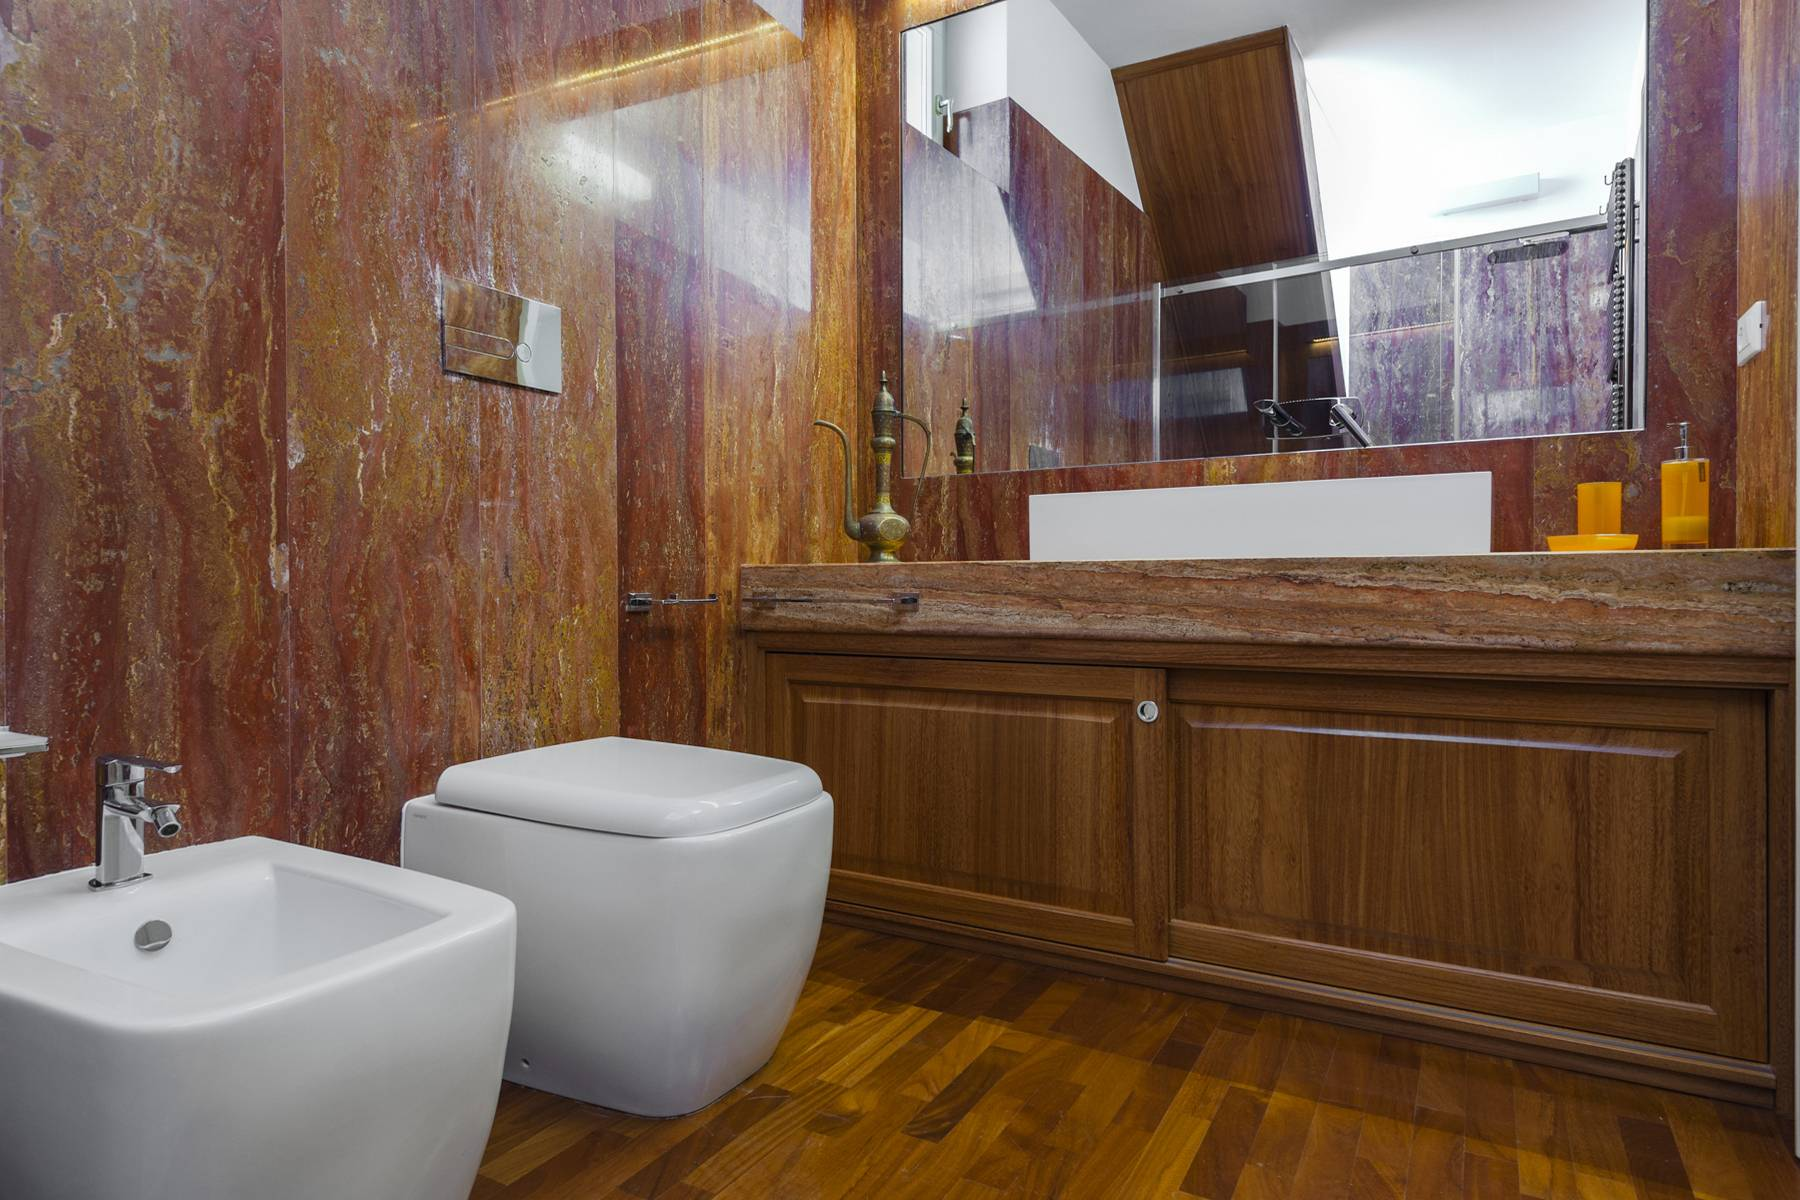 Appartamento in Vendita a Siracusa: 5 locali, 206 mq - Foto 24